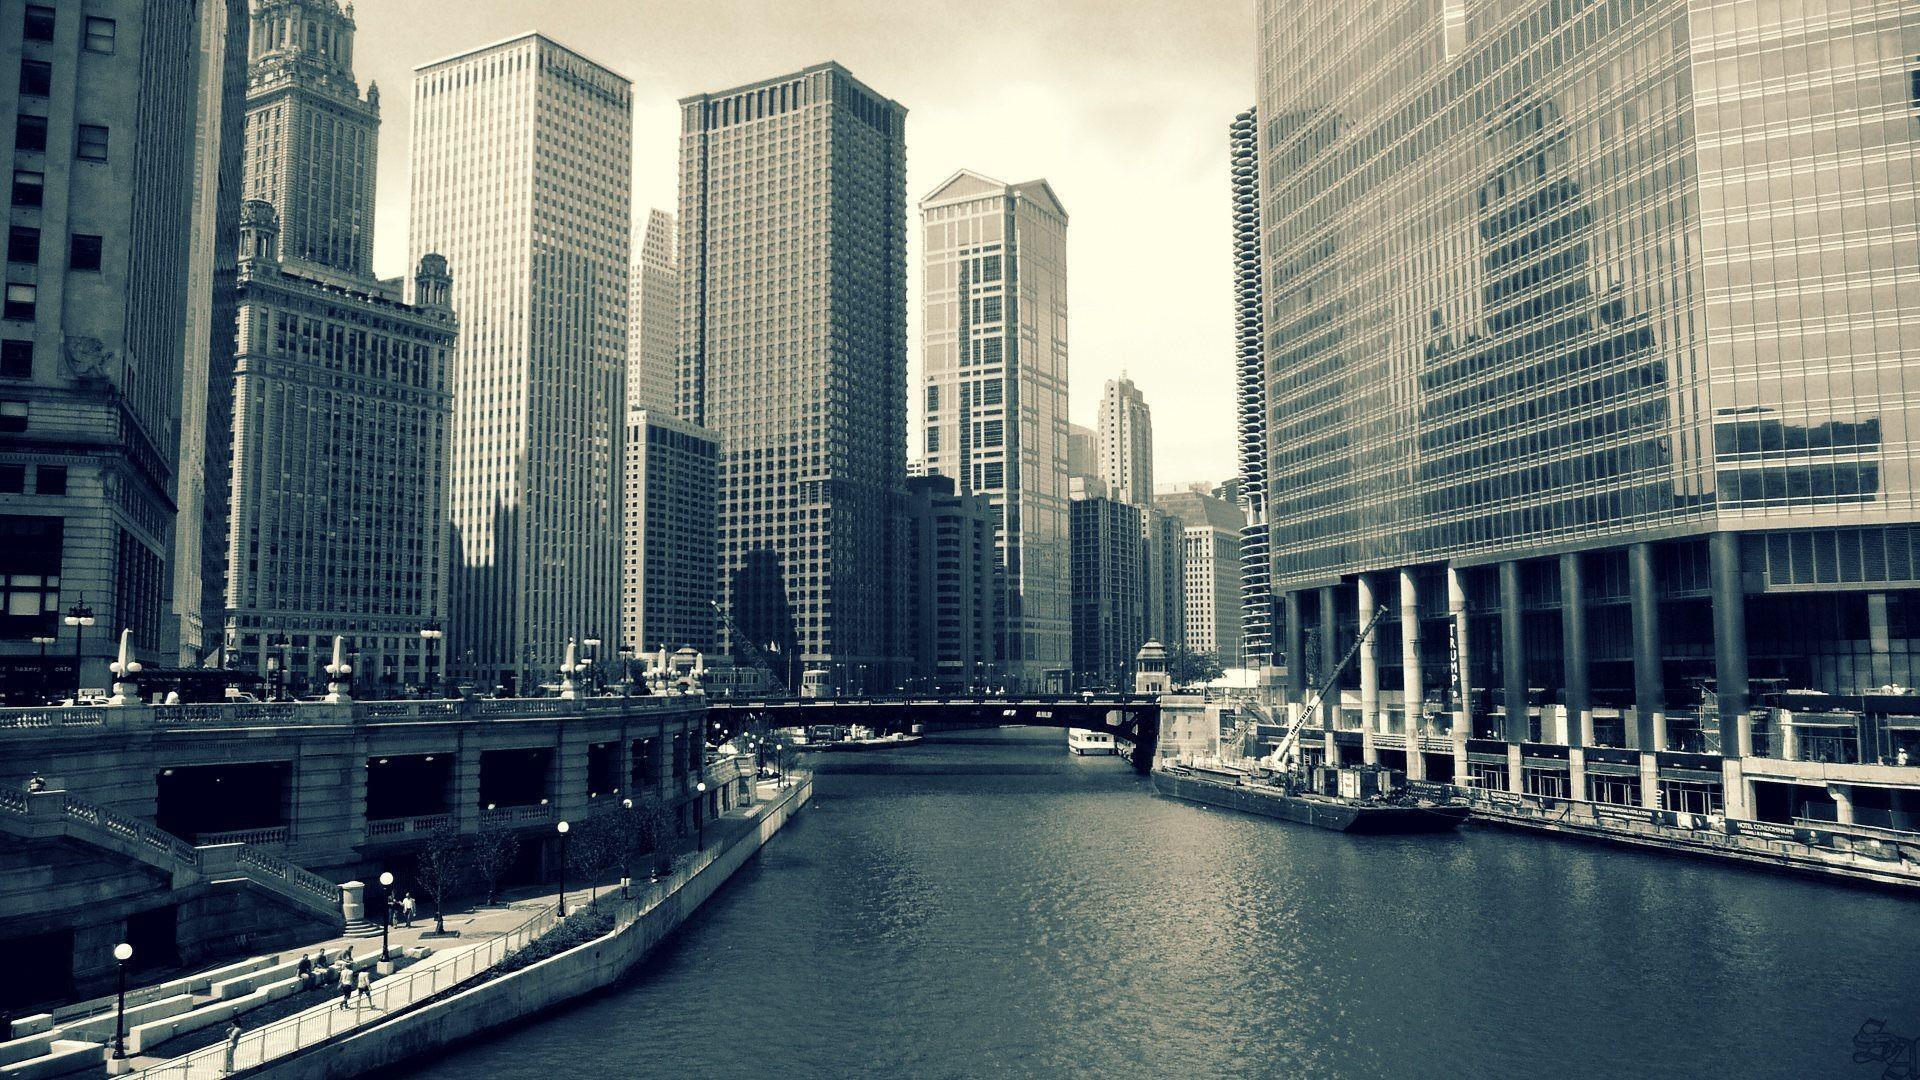 High Definition Live Chicago Backgrounds – 780610189, Hal Laffin